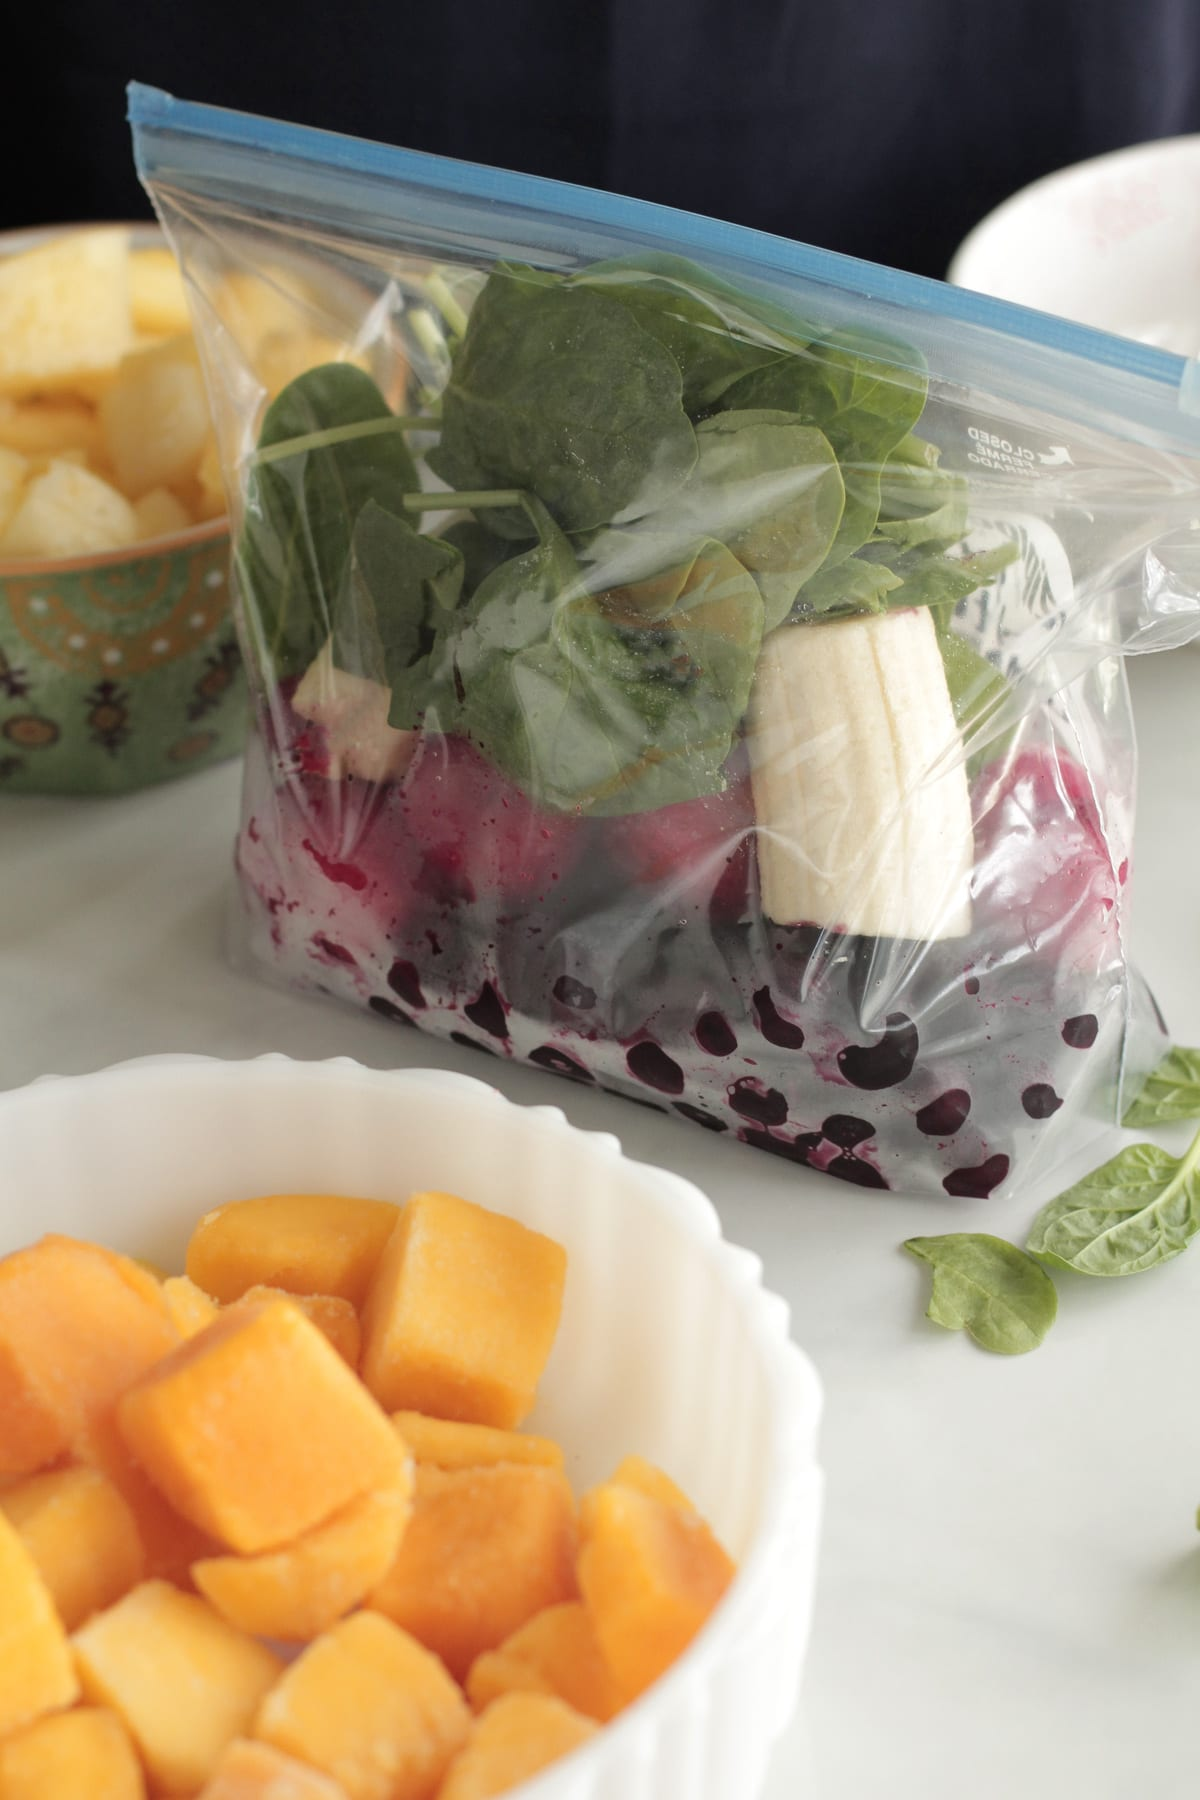 DIY Freezer Smoothie Packs: 5 Recipes to Get You Started